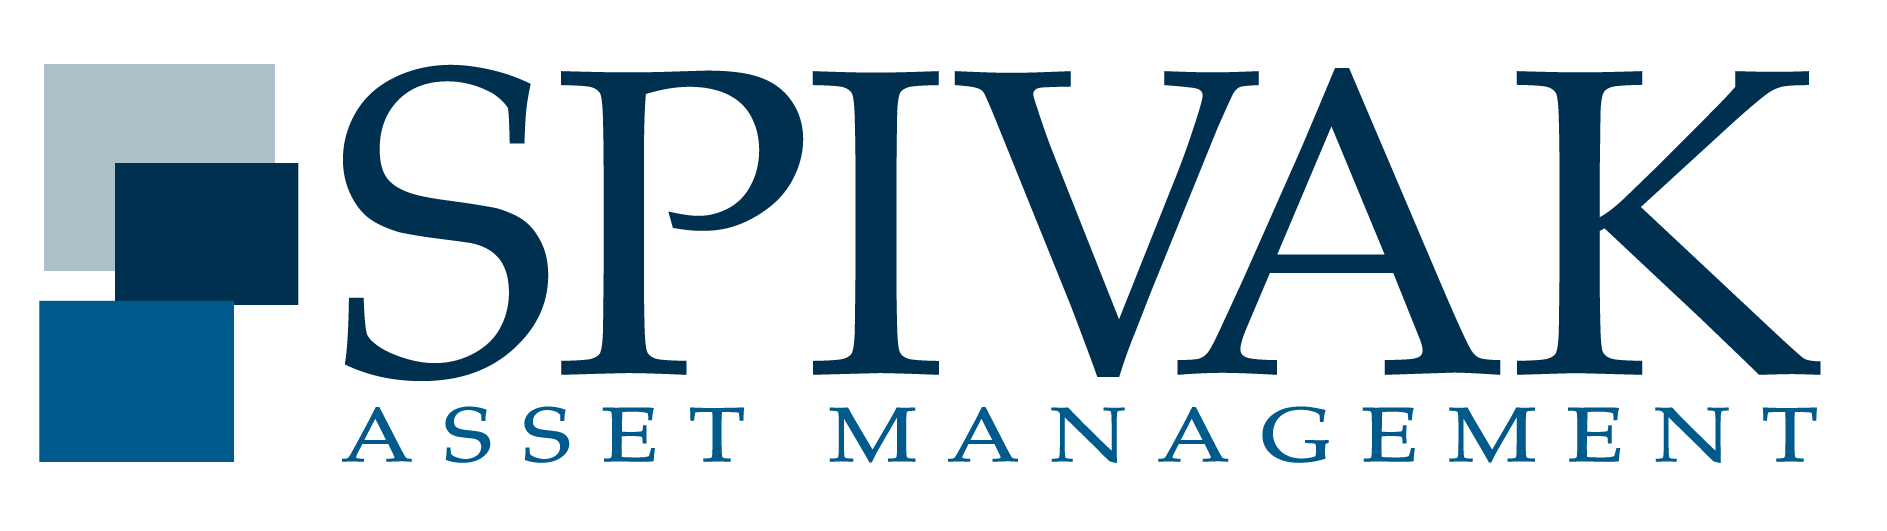 spivak-Asset-Management-logo-nobackground